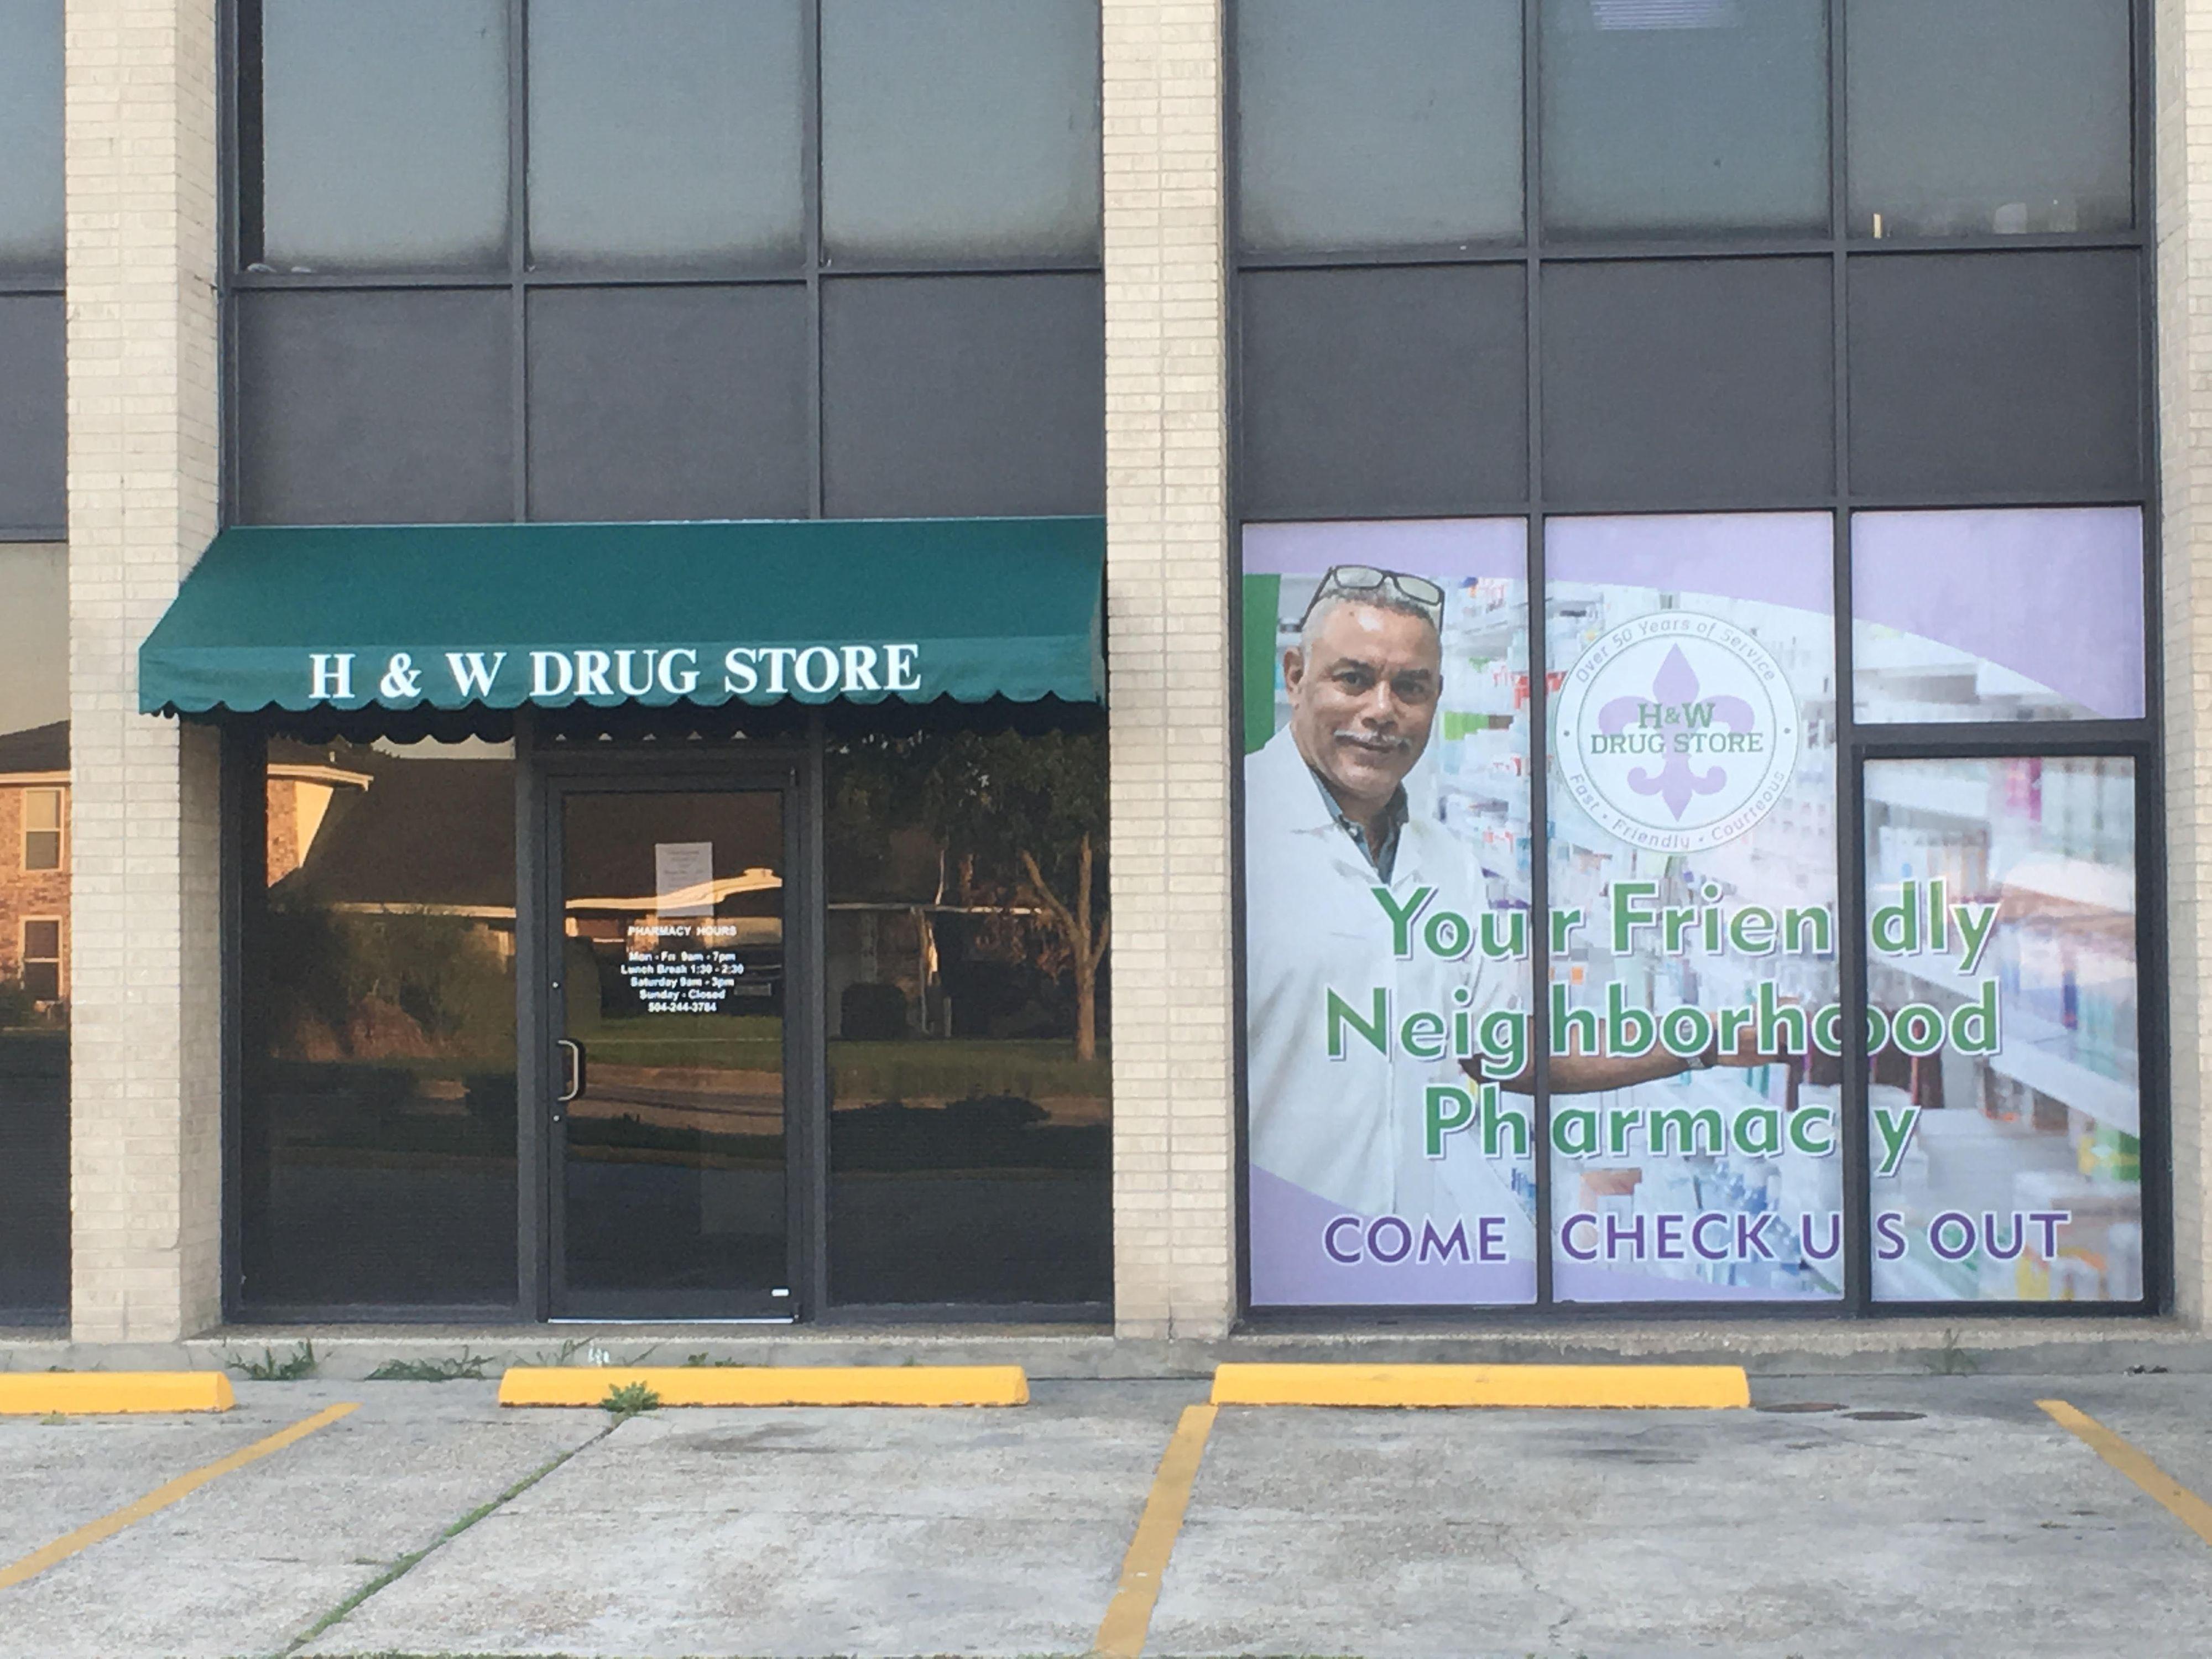 H & W Drug Store